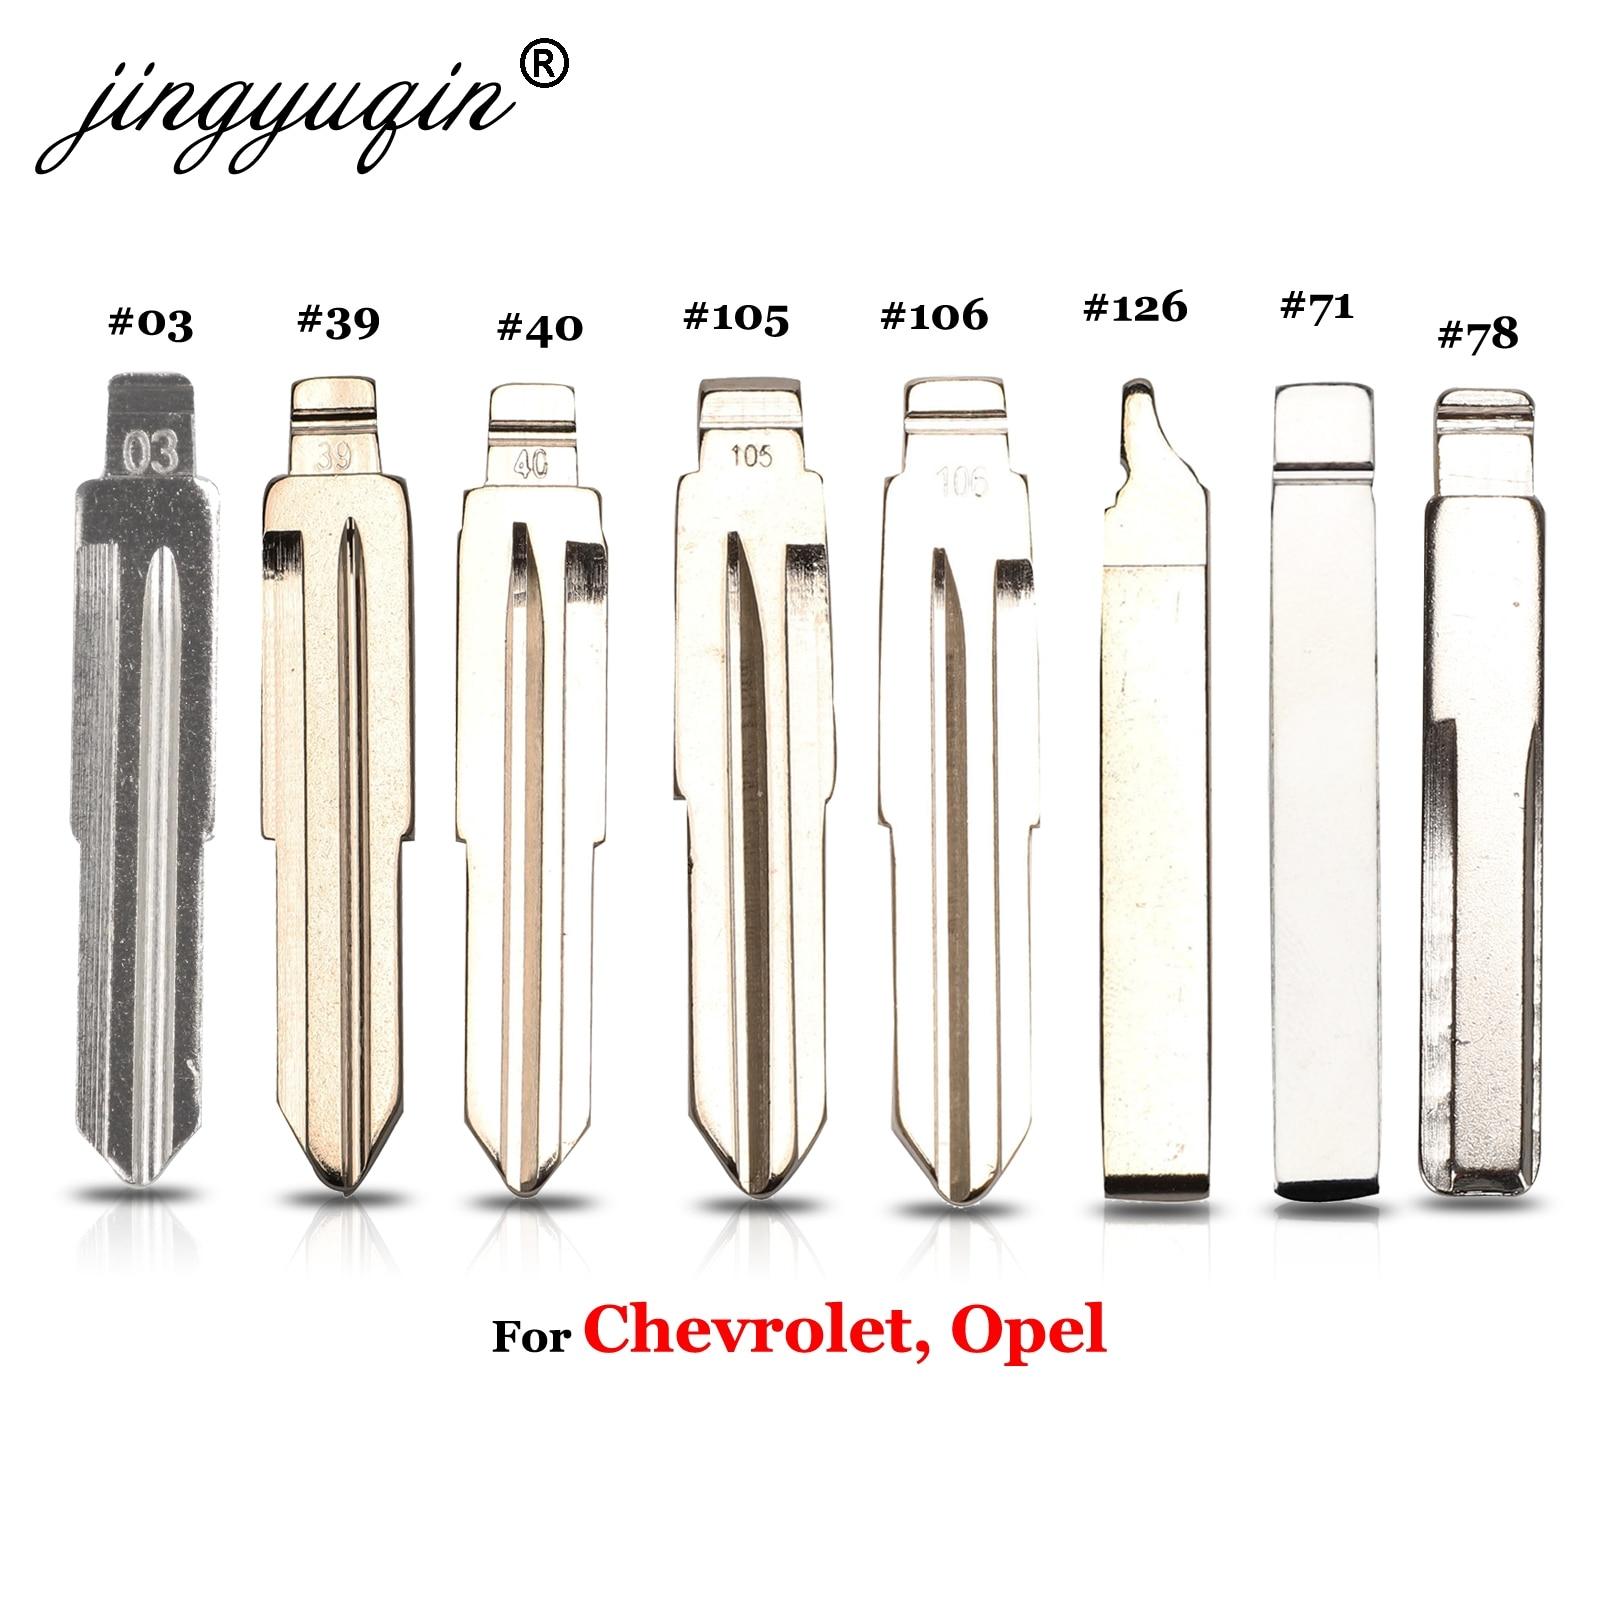 Jingyuqin флип Автомобильный ключ No.03 #39 40 105 106 71 # HU100 для Chevrolet Cruze SPrak Aveo Camaro Equinox Opel HU43 KD KEYDIY